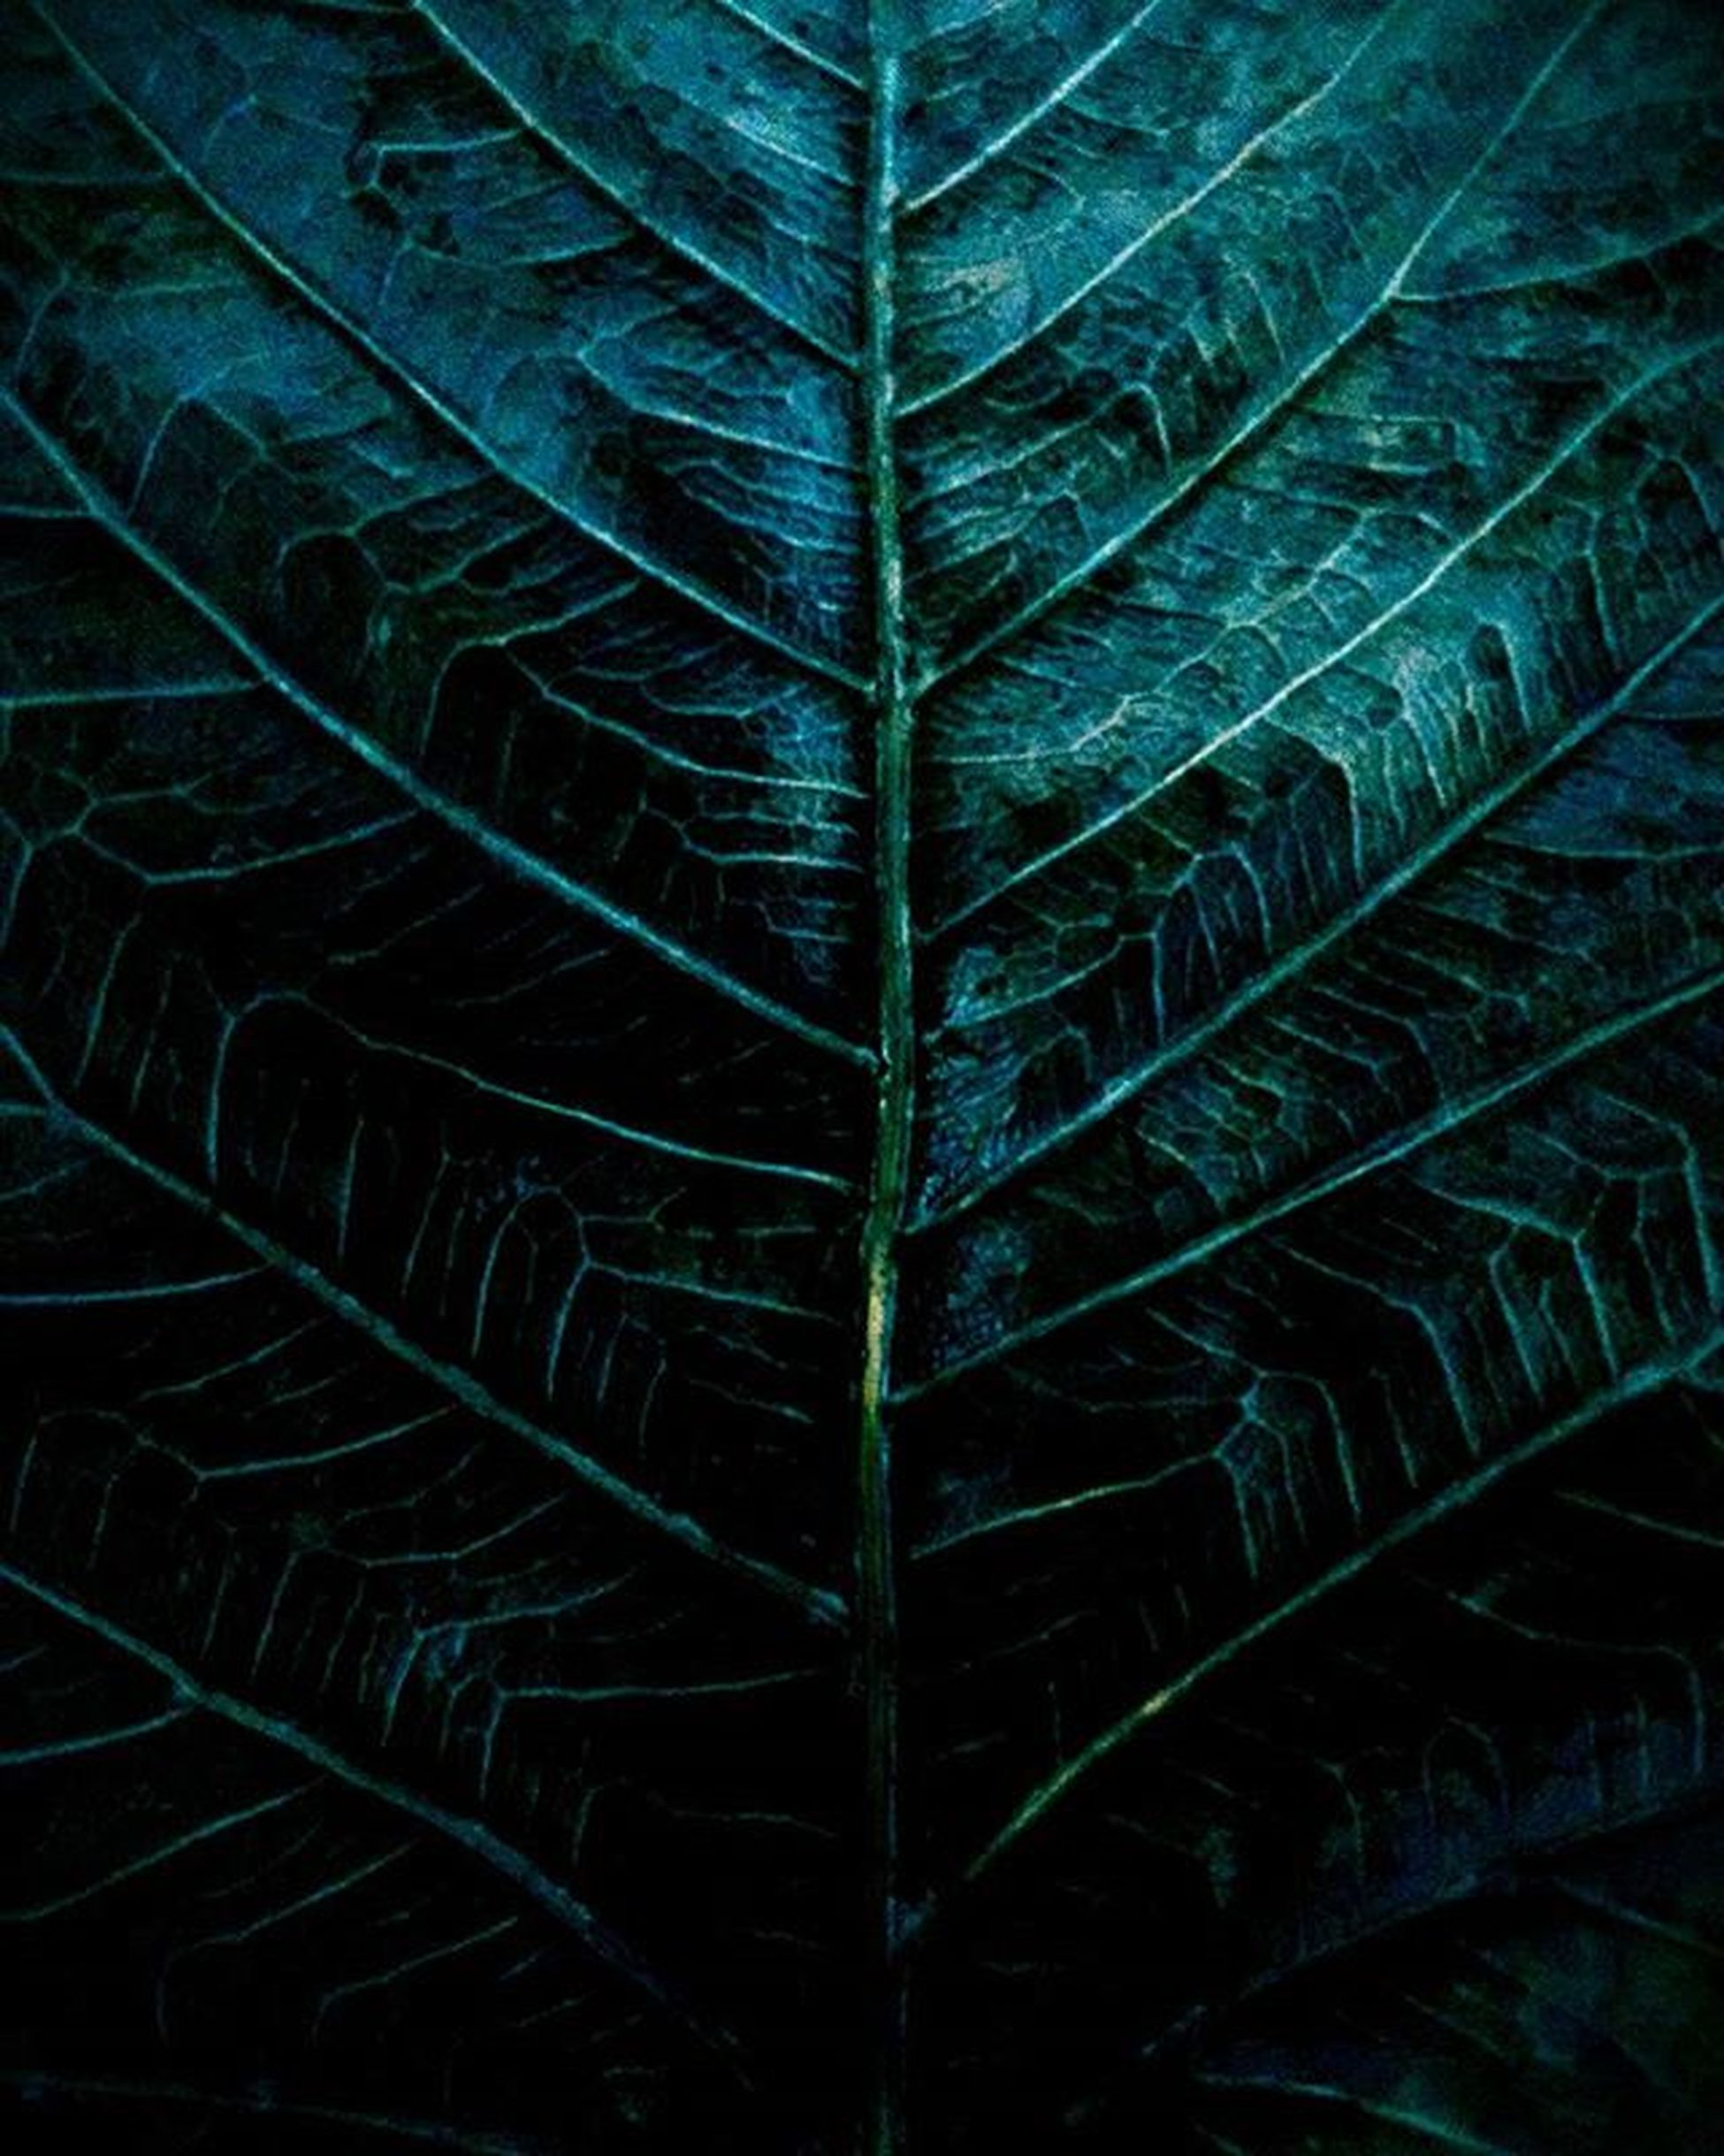 The Peepal Tree. Sacredfig Peepaltree Trippy Abstractphotography Asimphotography